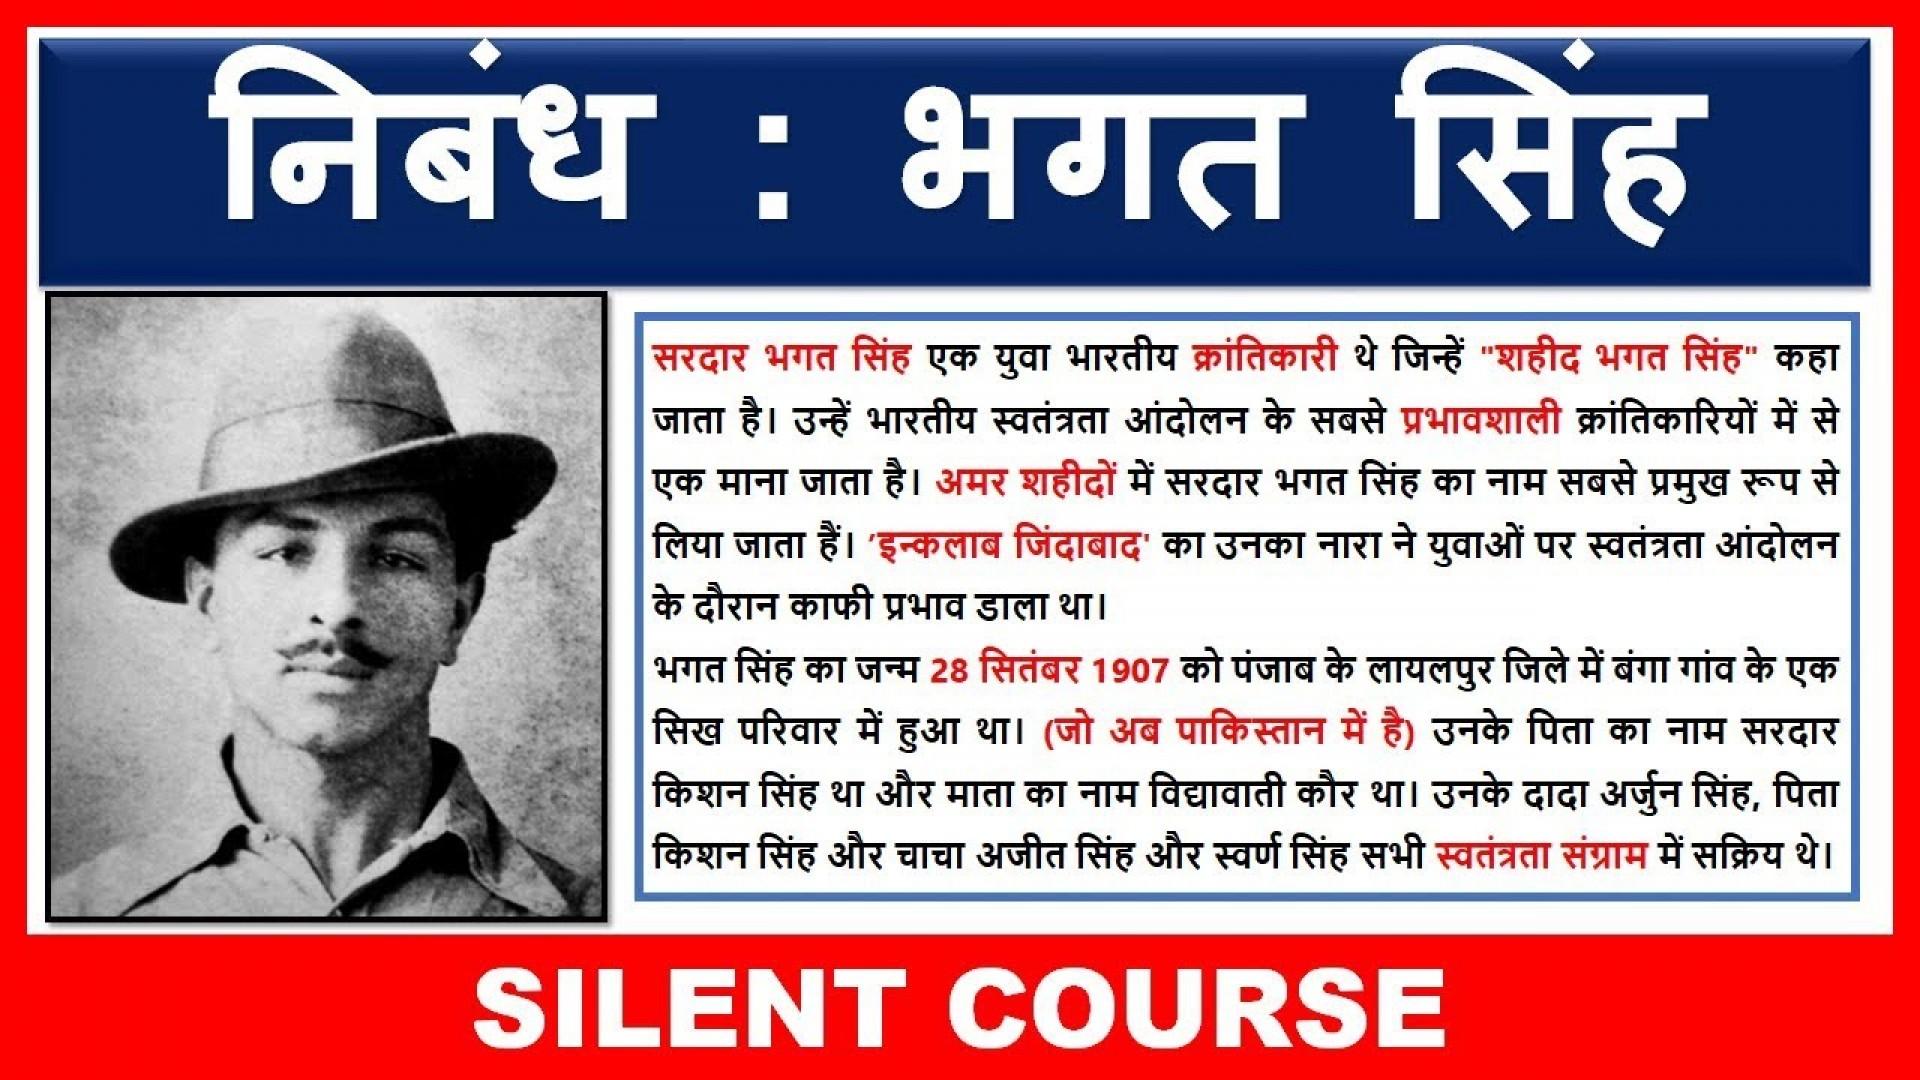 011 Maxresdefault Essay Example On Bhagat Singh In Unique Marathi Short 100 Words 1920